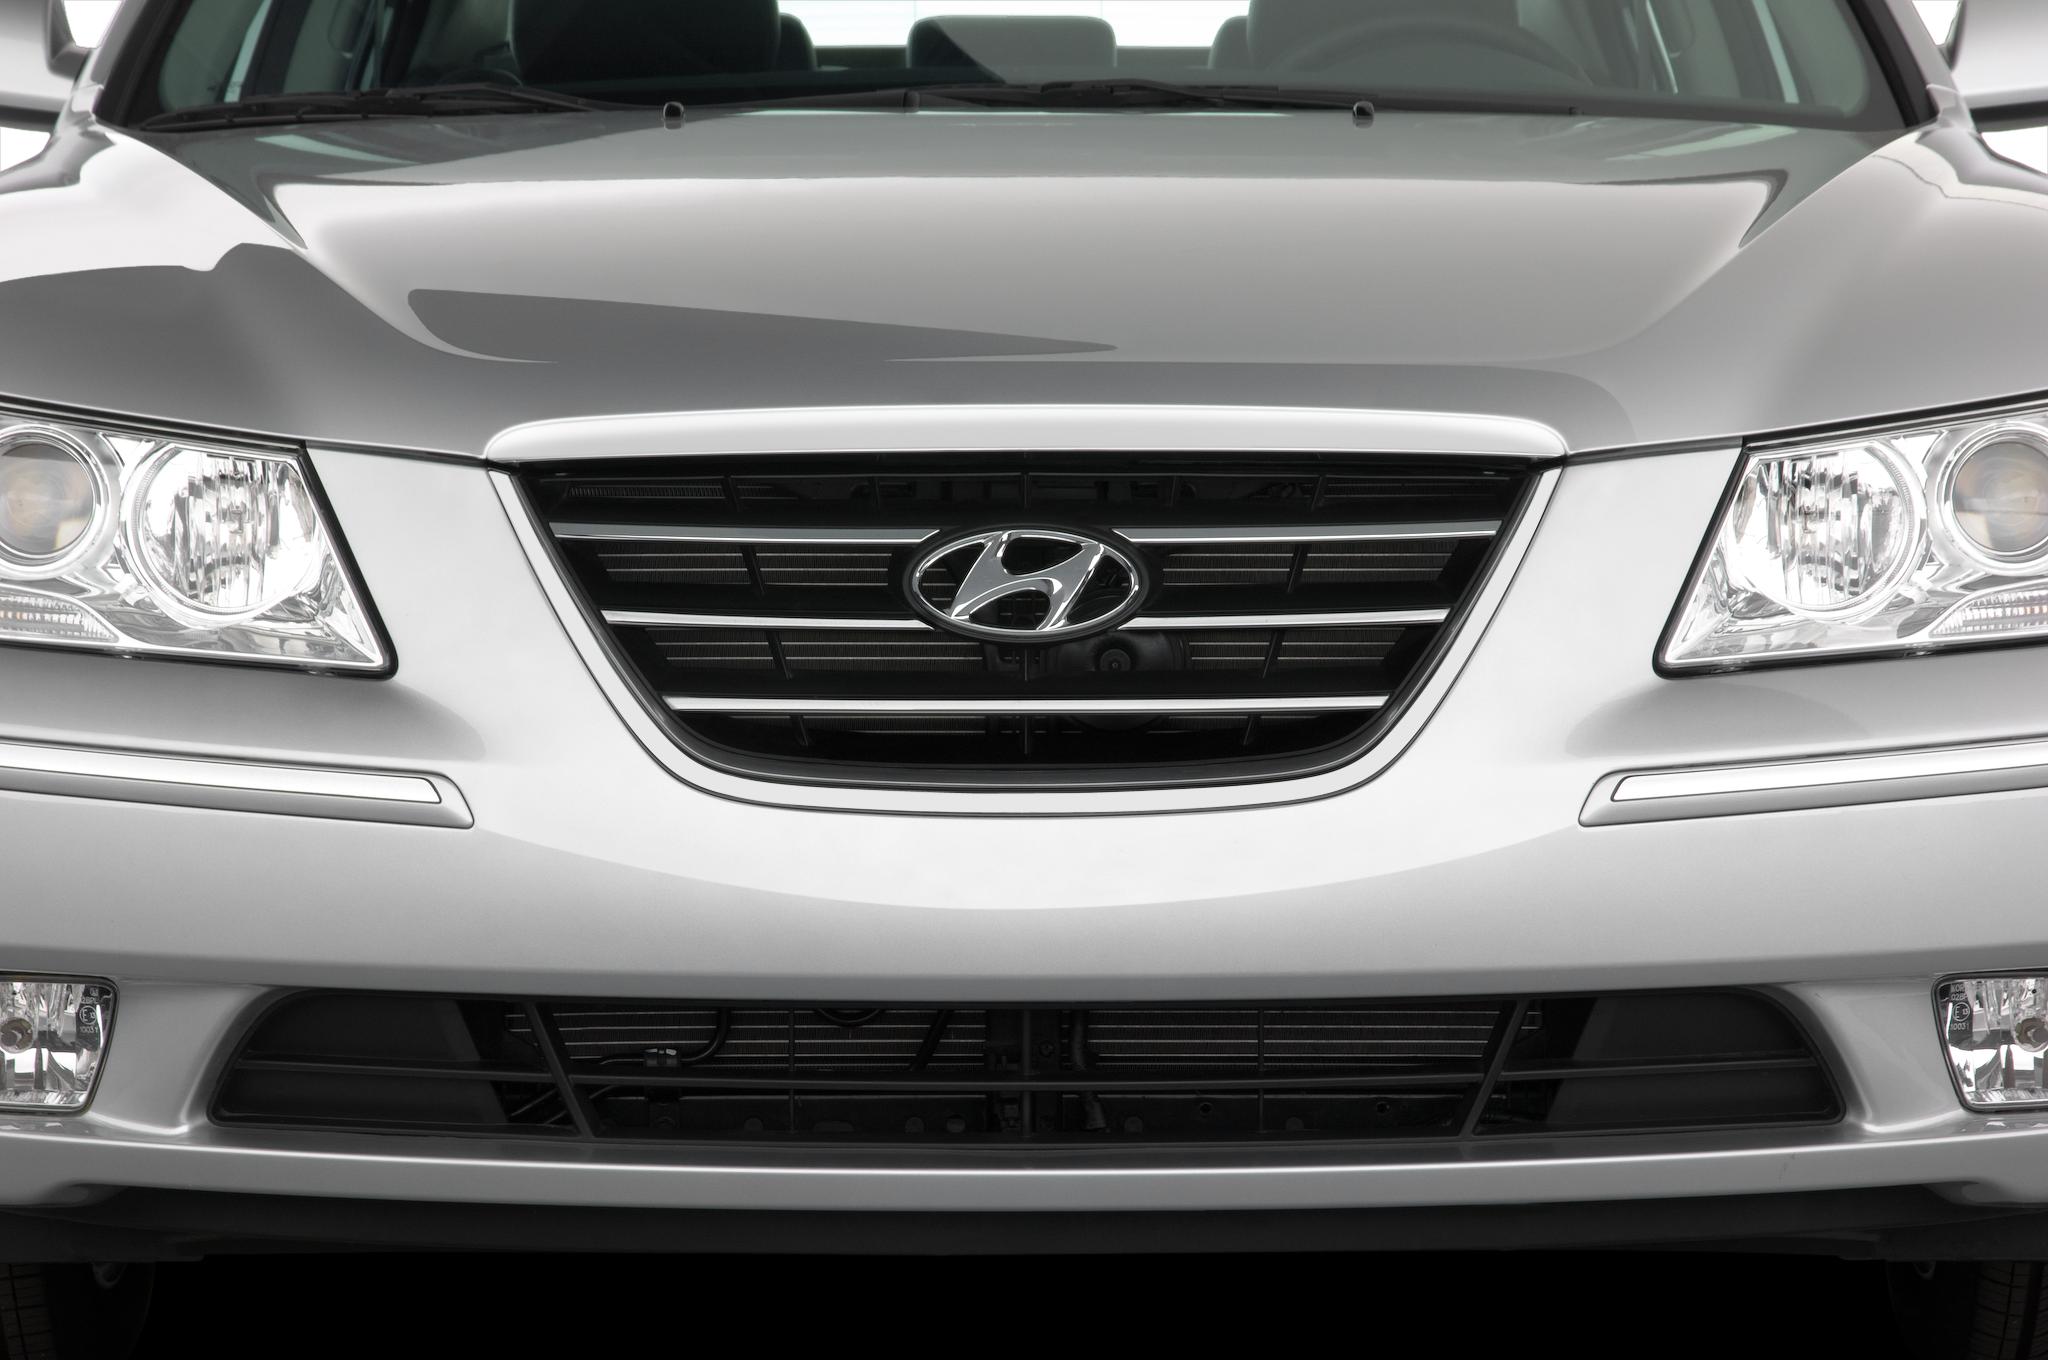 2010 Hyundai Sonata Se Midsize Sedan Review Automobile Elantra Engine Diagram 3 25